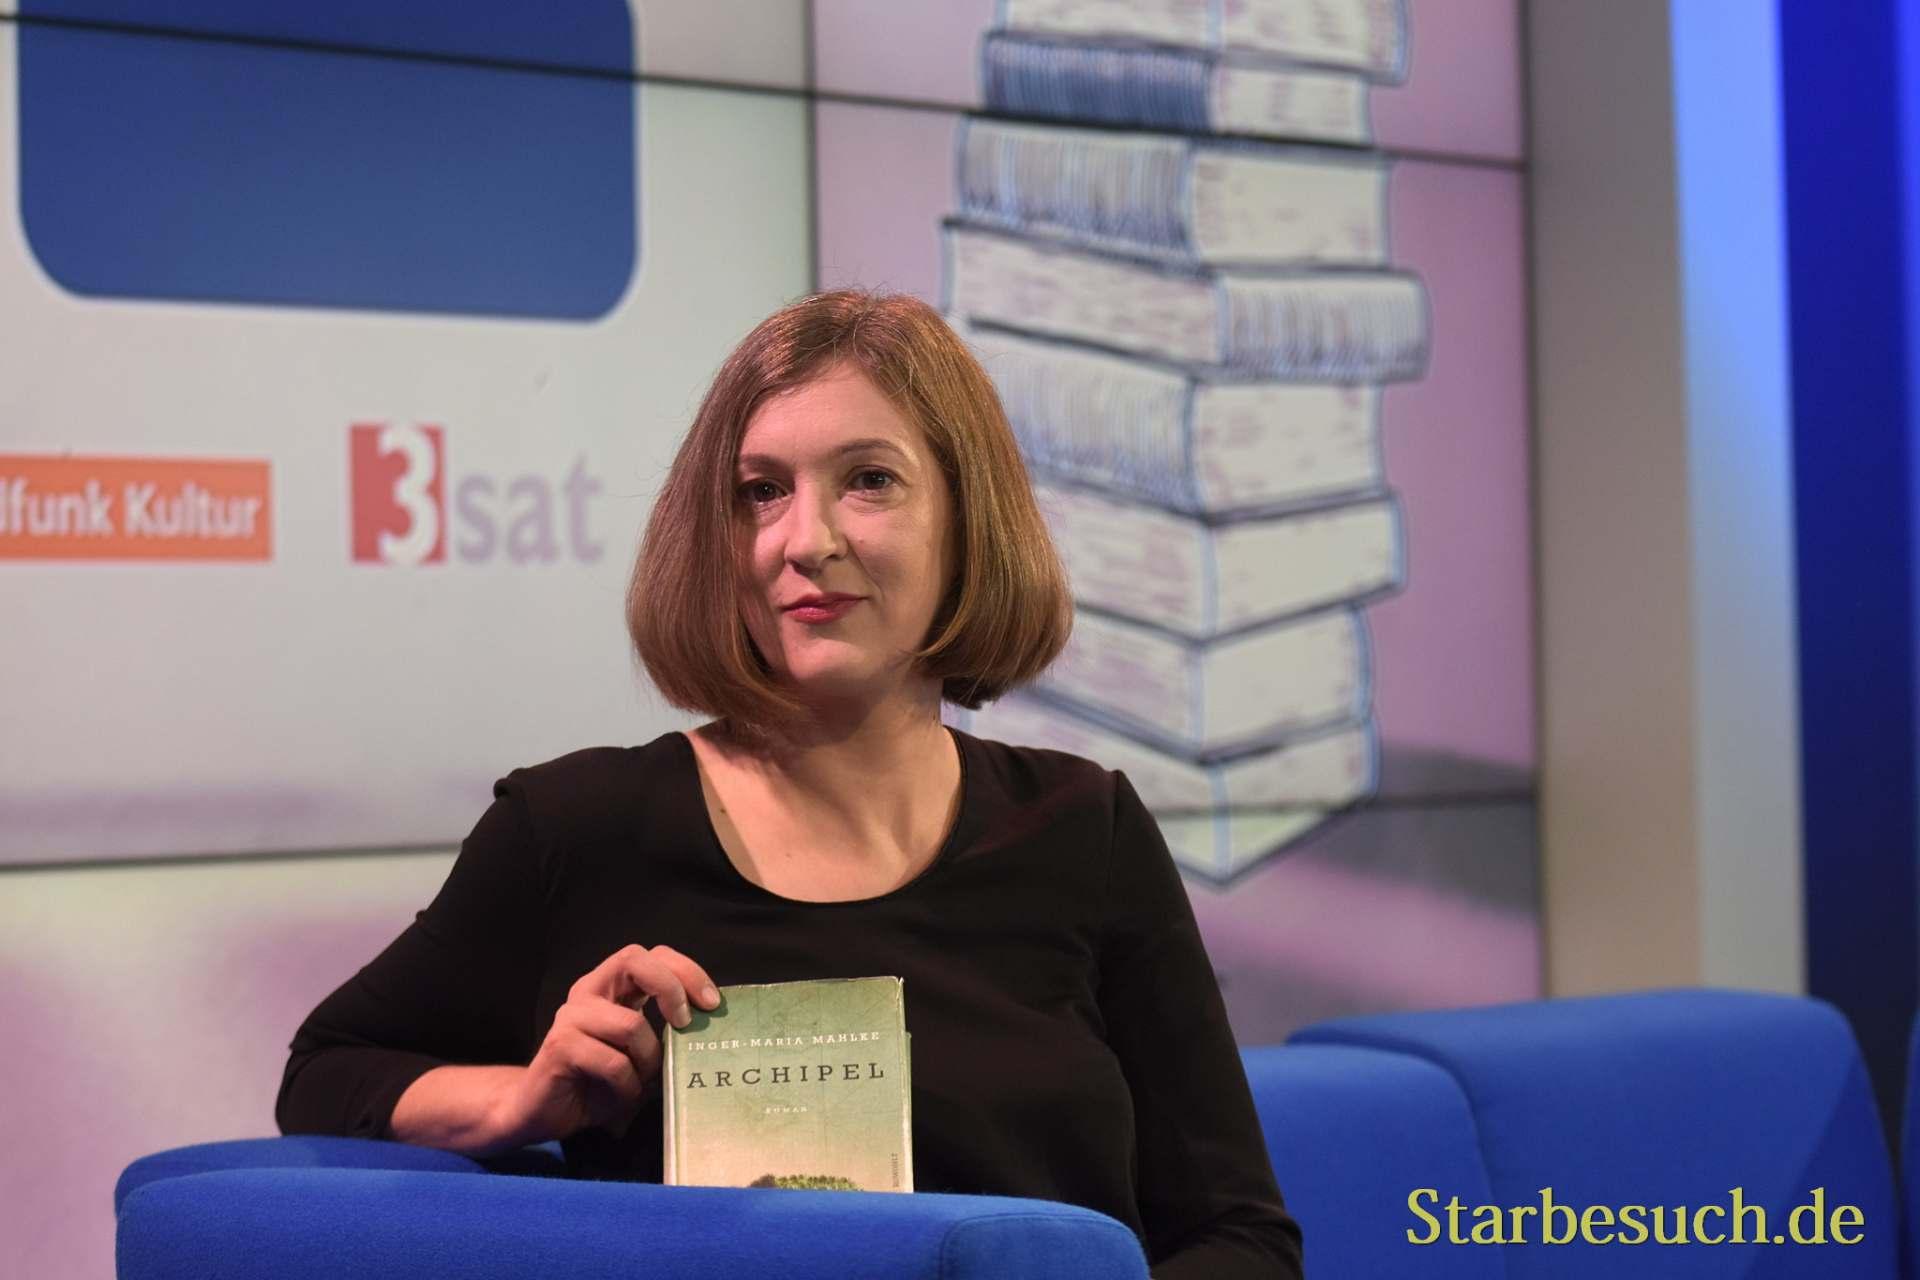 Inger-Maria Mahlke, Buchpreisträgerin 2018